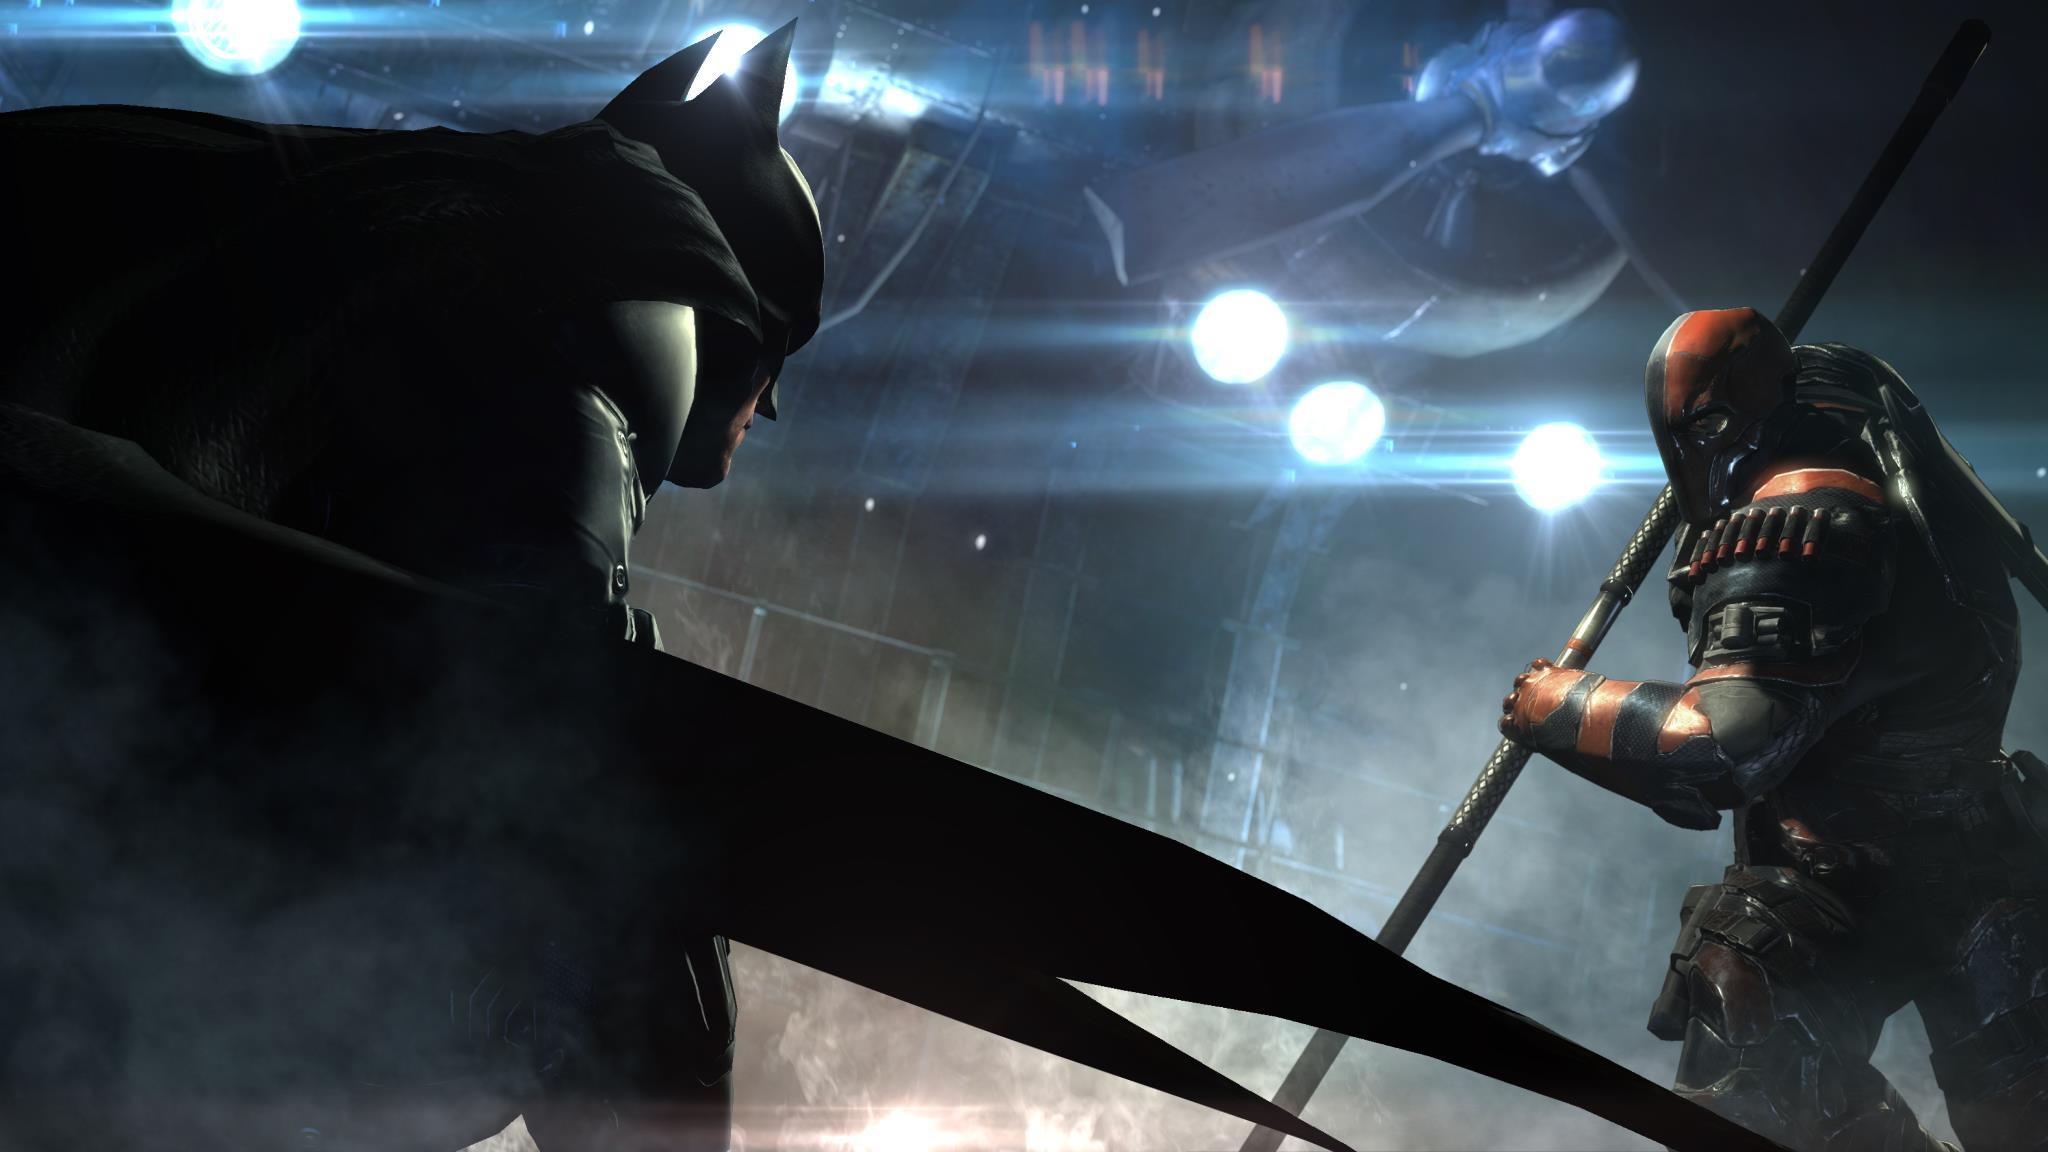 Official - It s Simple. We Kill the Batman